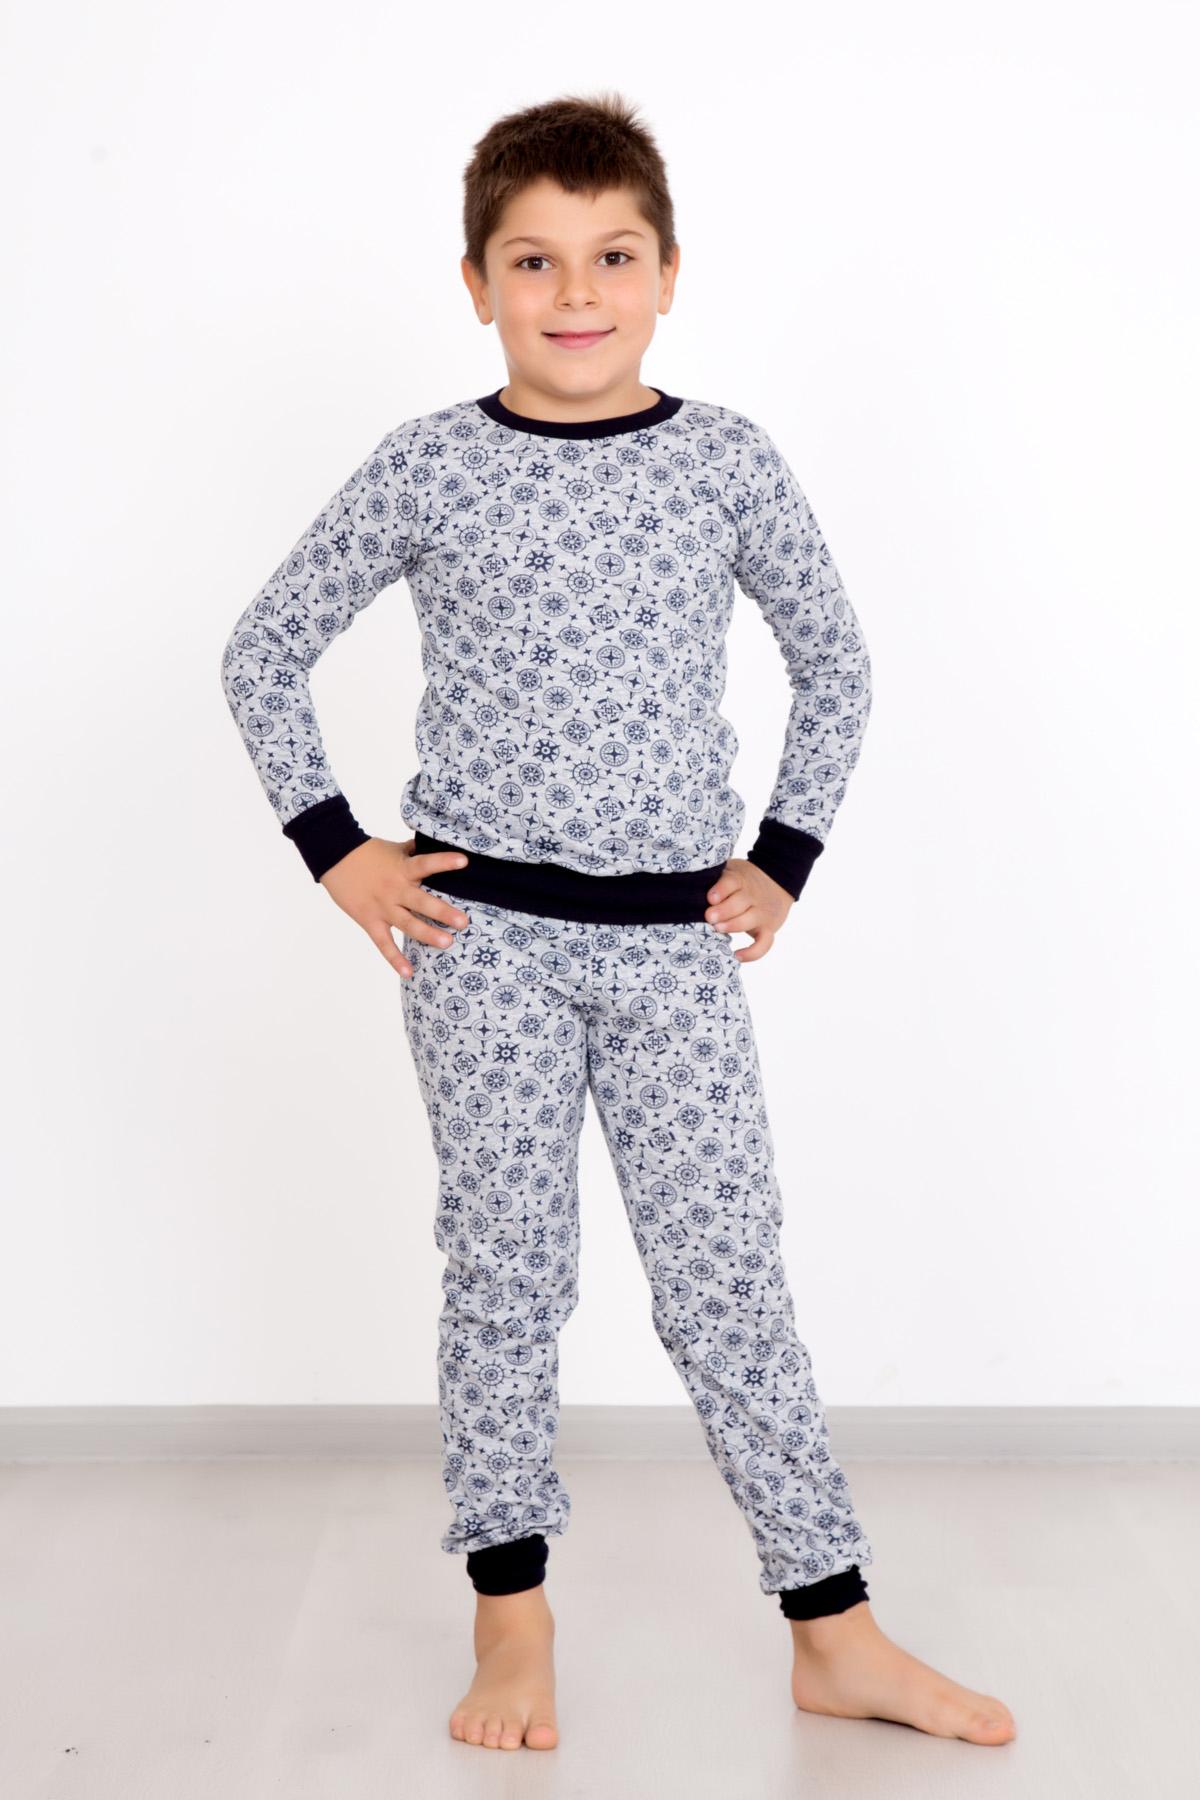 Дет. пижама Морячок р. 30Костюмы<br><br><br>Тип: Дет. пижама<br>Размер: 30<br>Материал: Кулирка